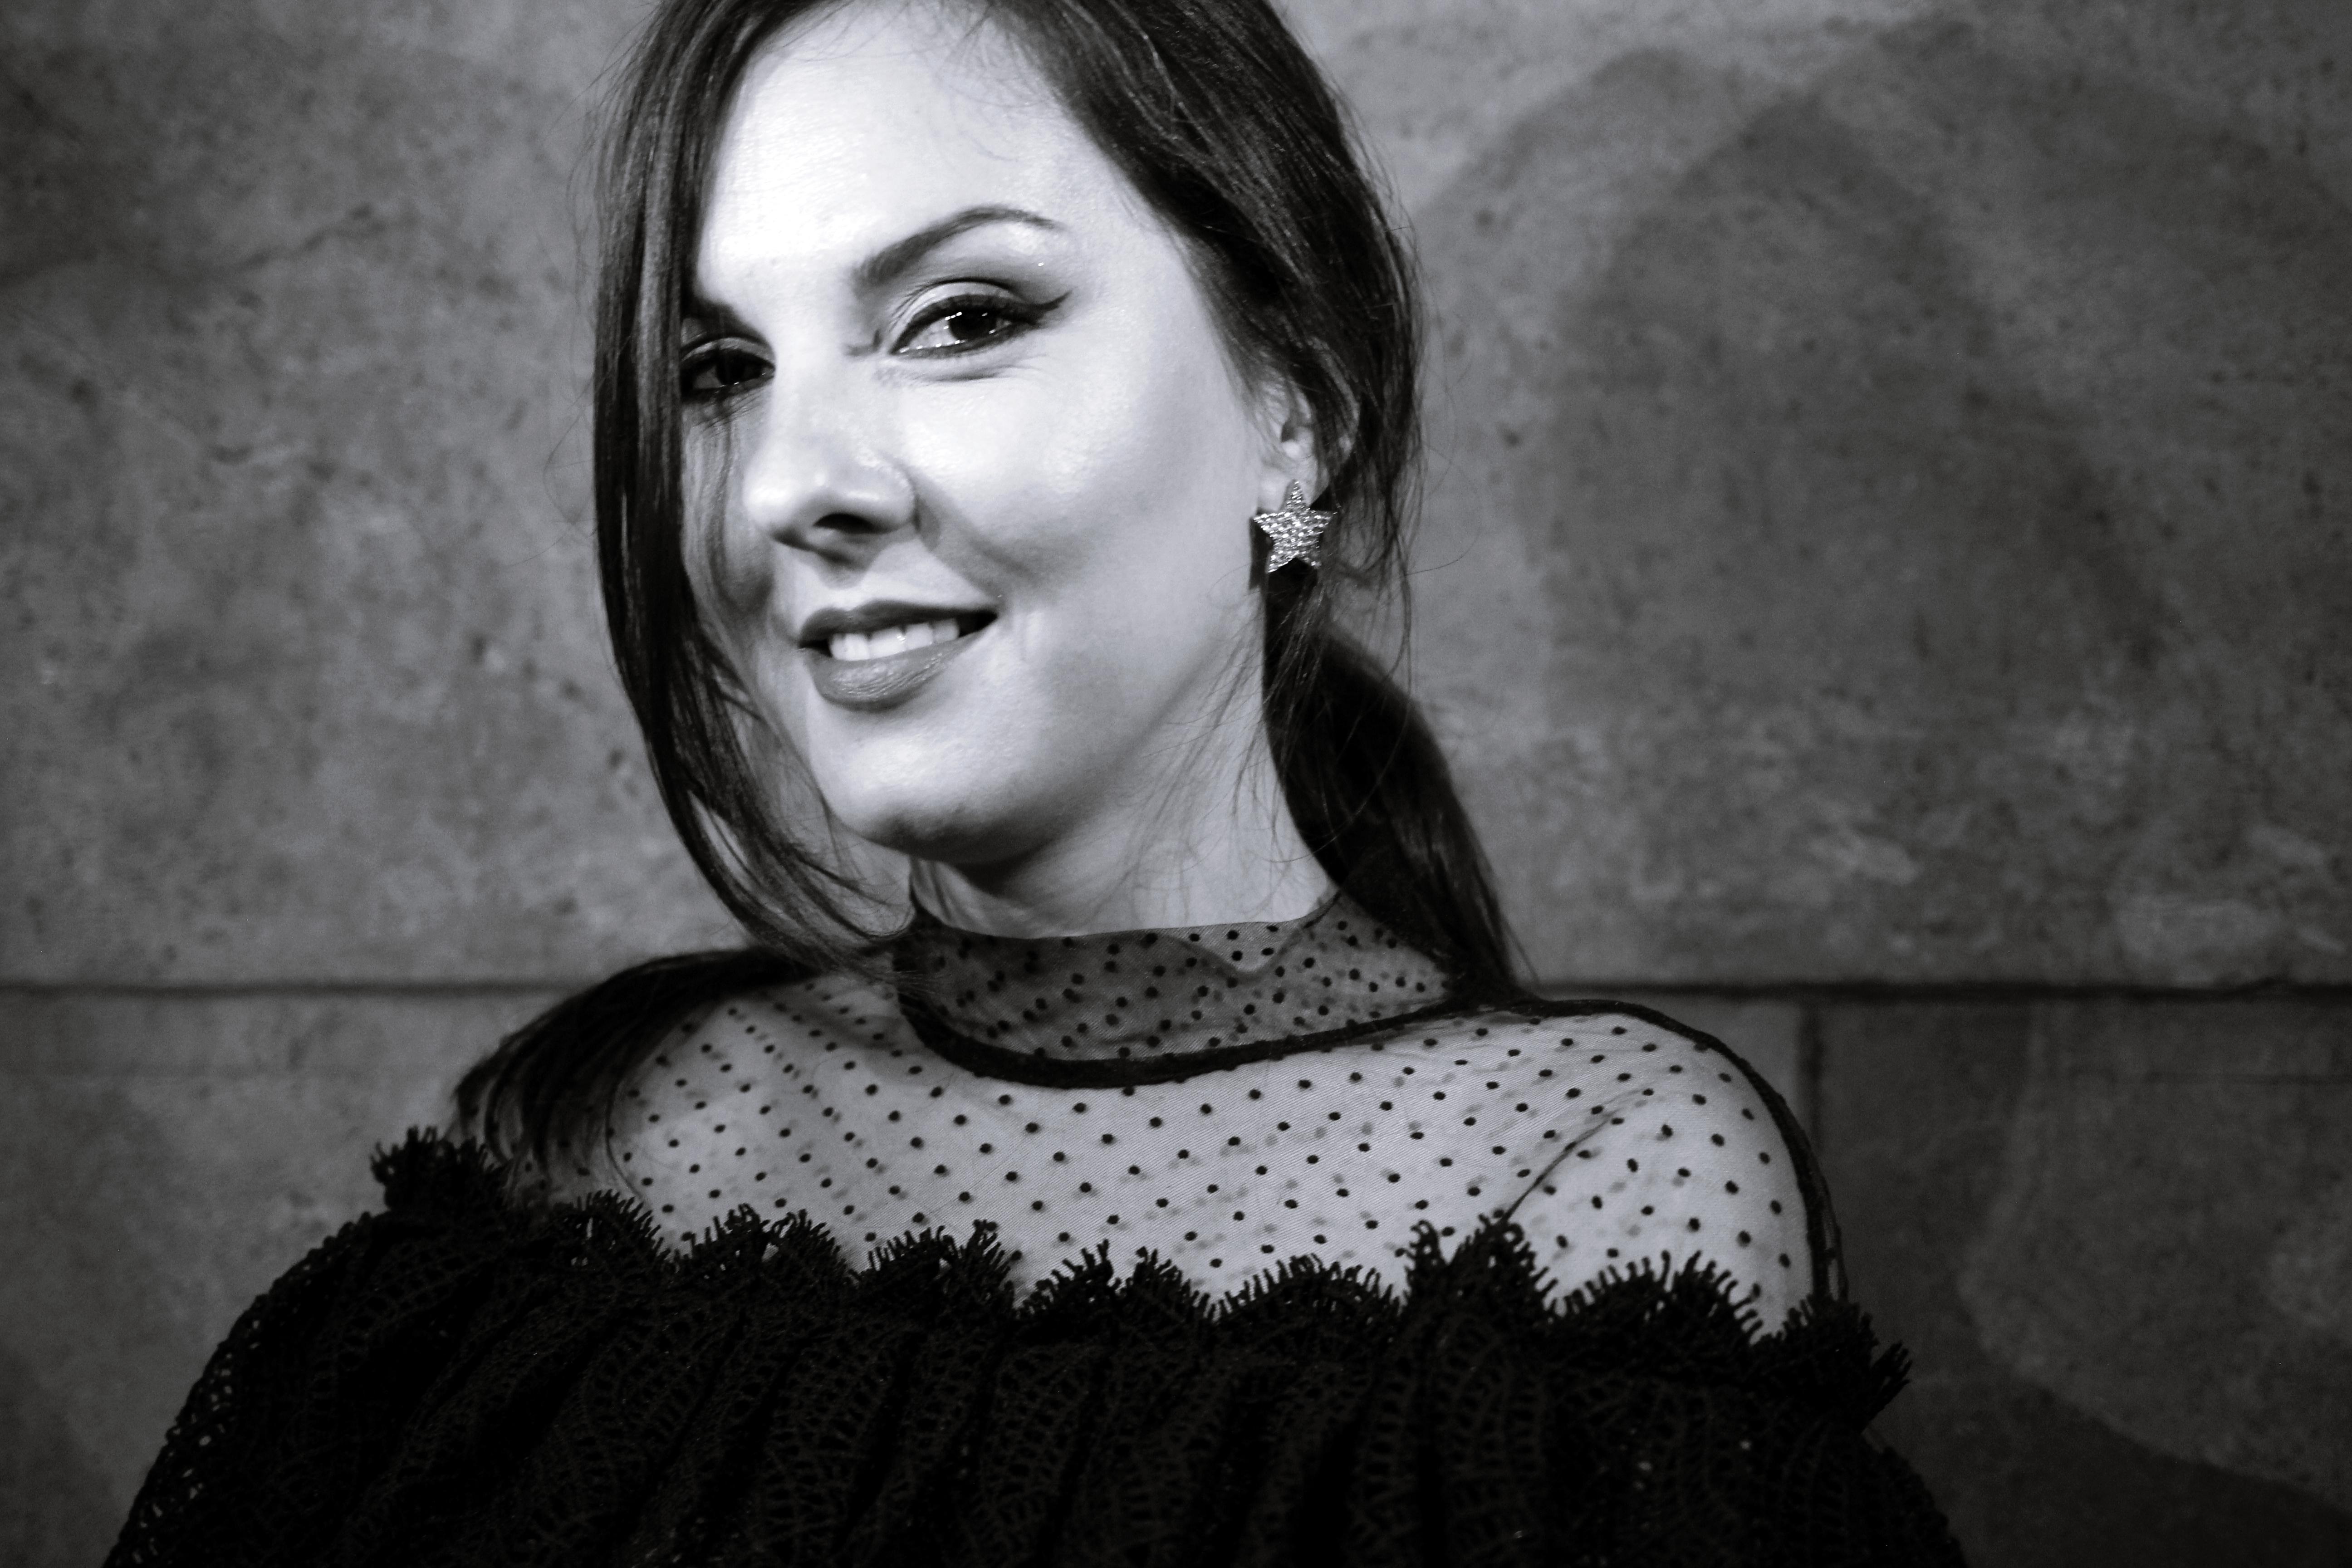 Raluca Dumitrescu